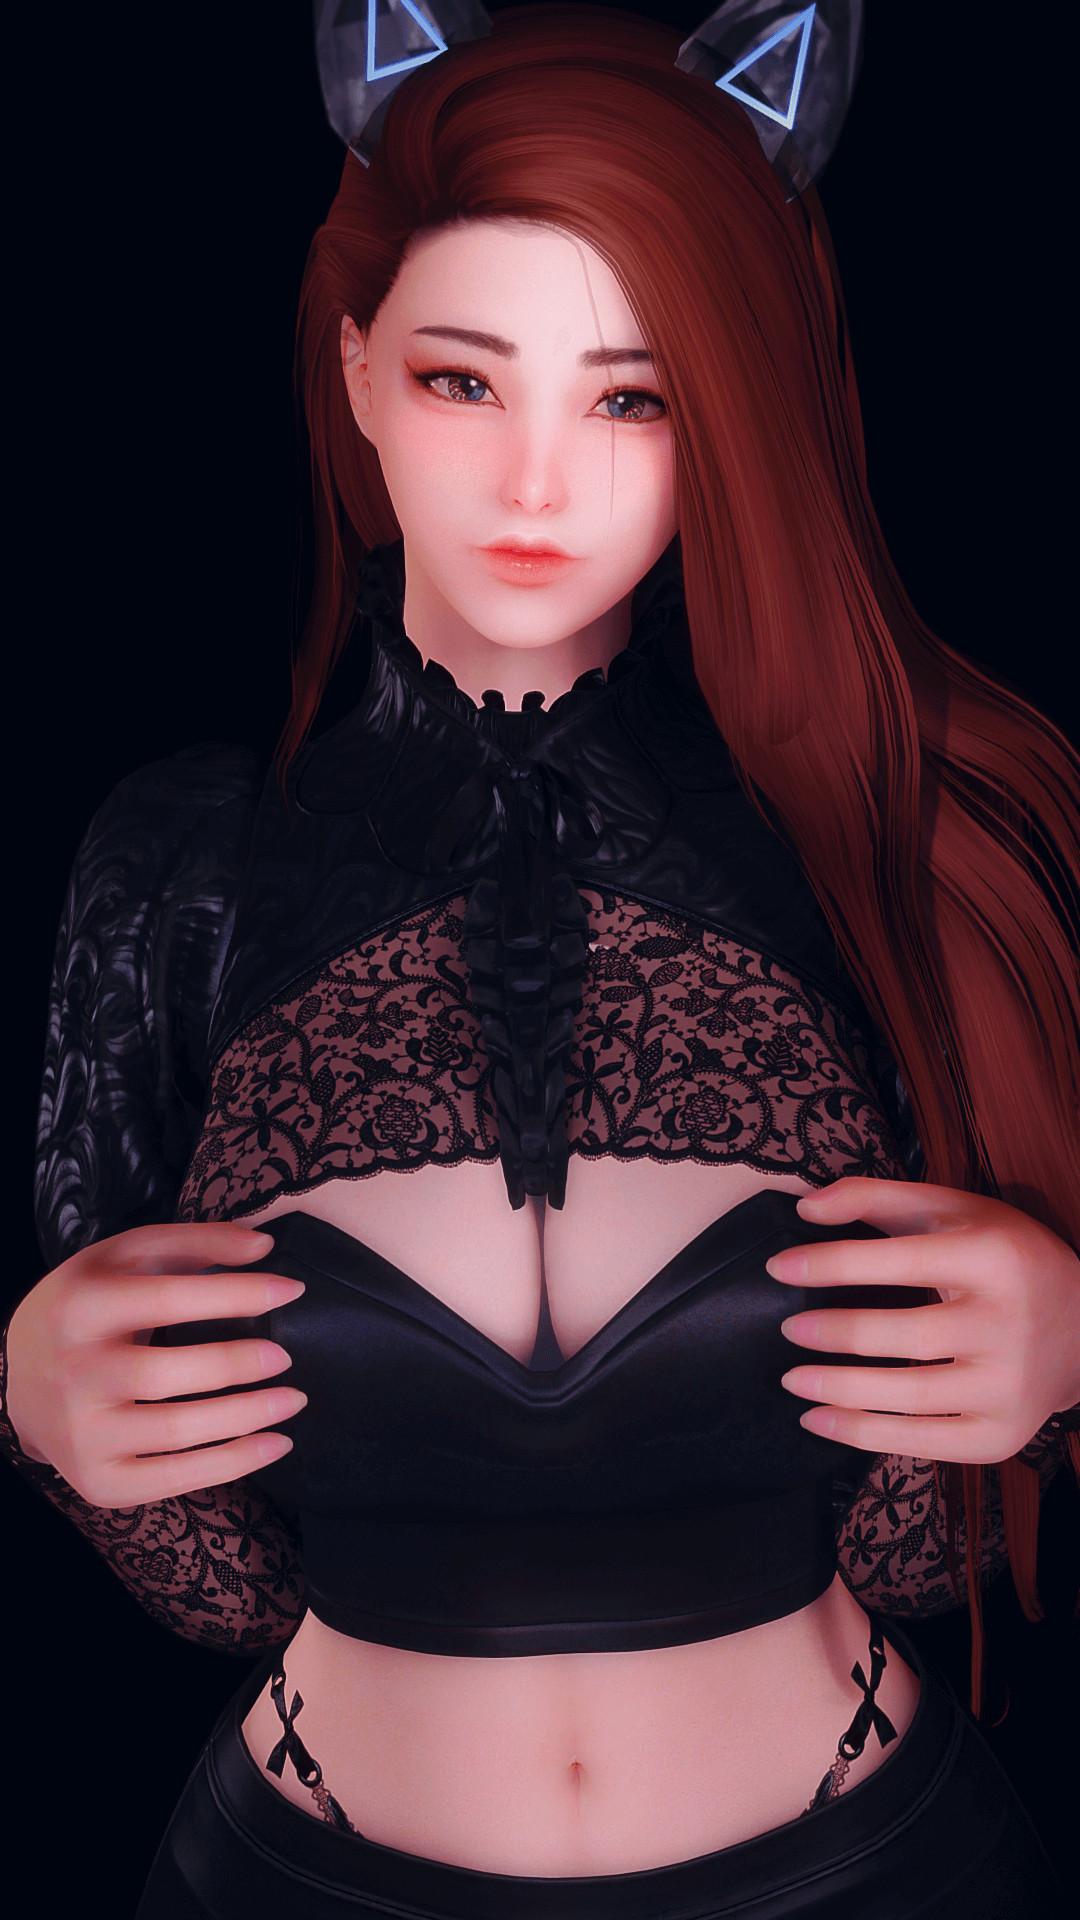 [COCO] Ahri Uniforms v2